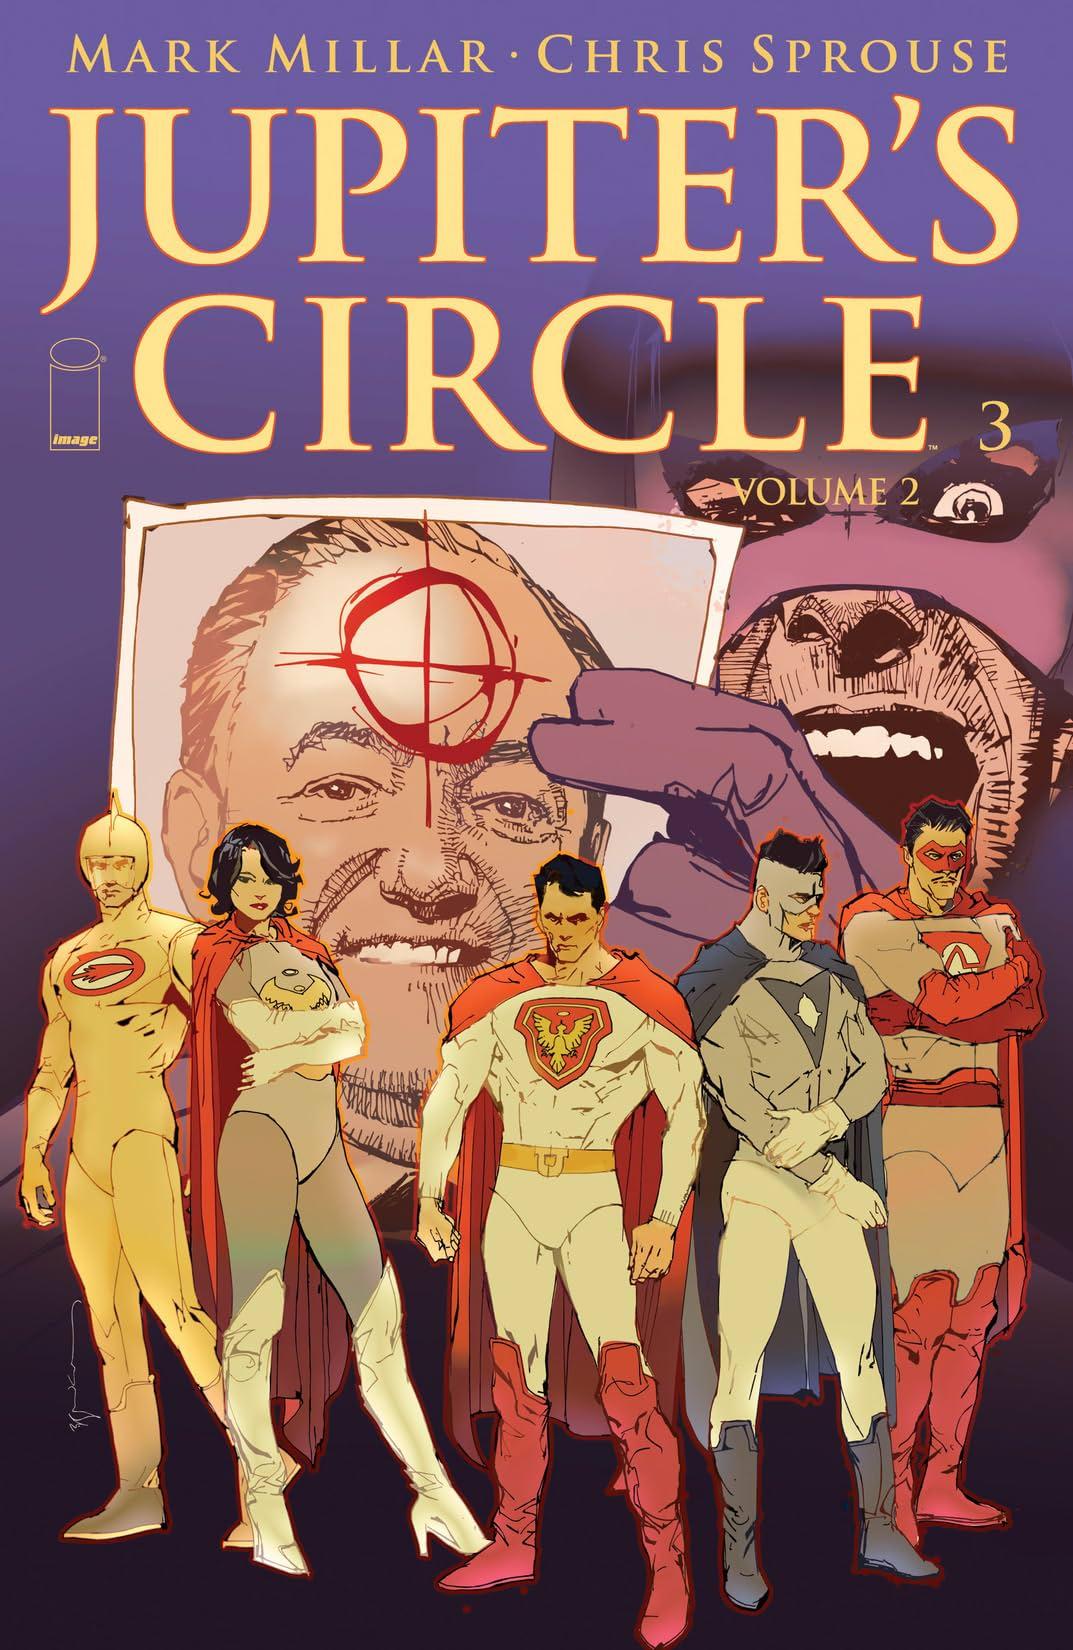 Jupiter's Circle Vol. 2 #3